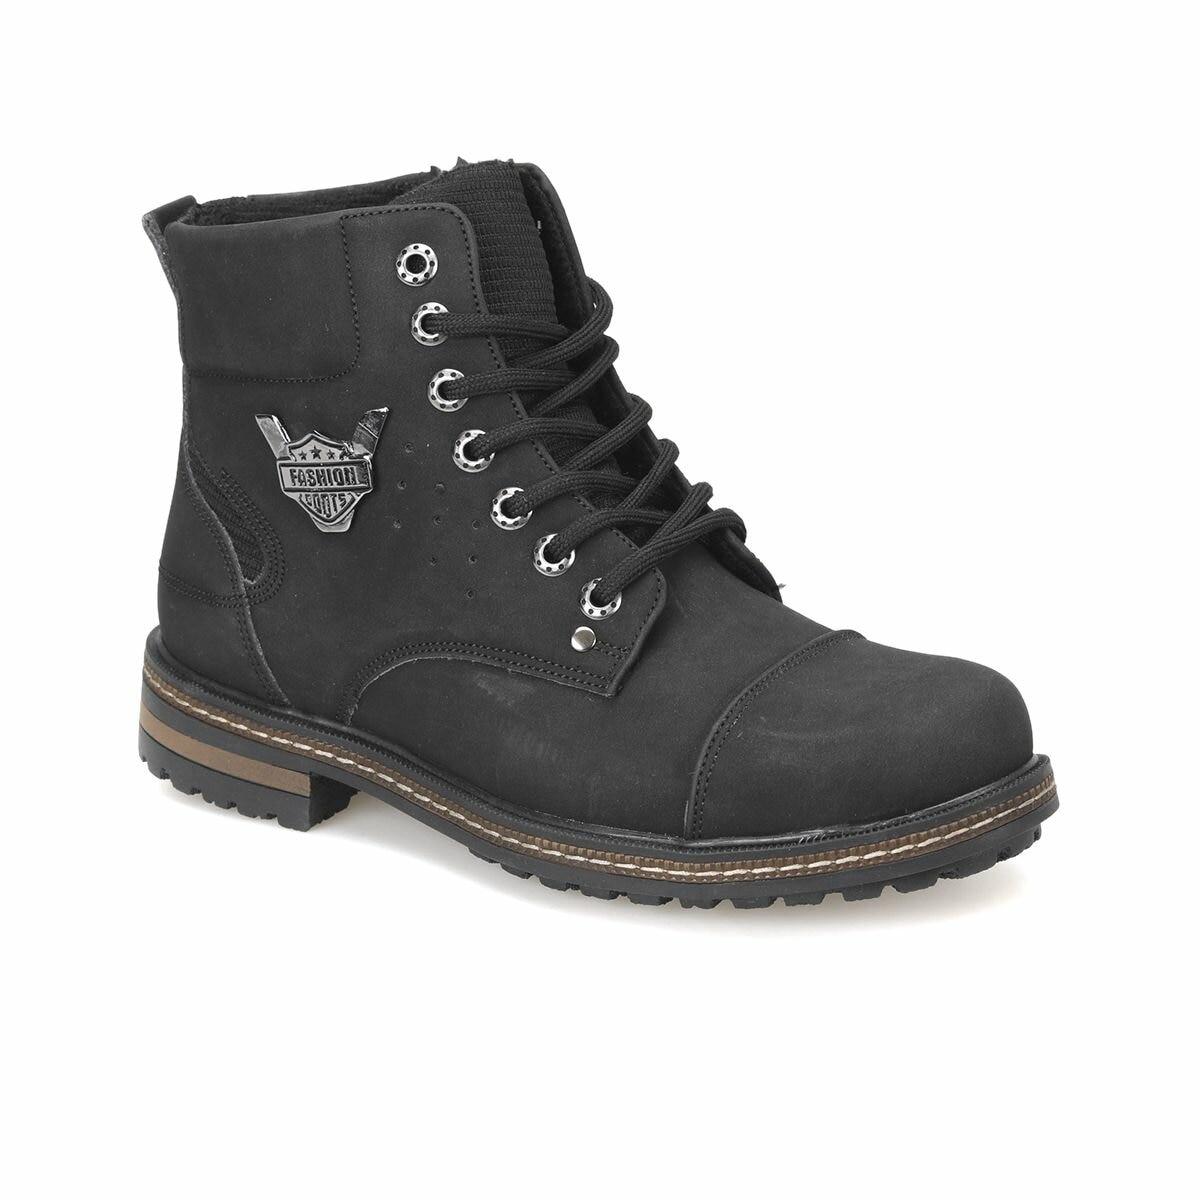 FLO LG-001 Black Men Boots Panama Club